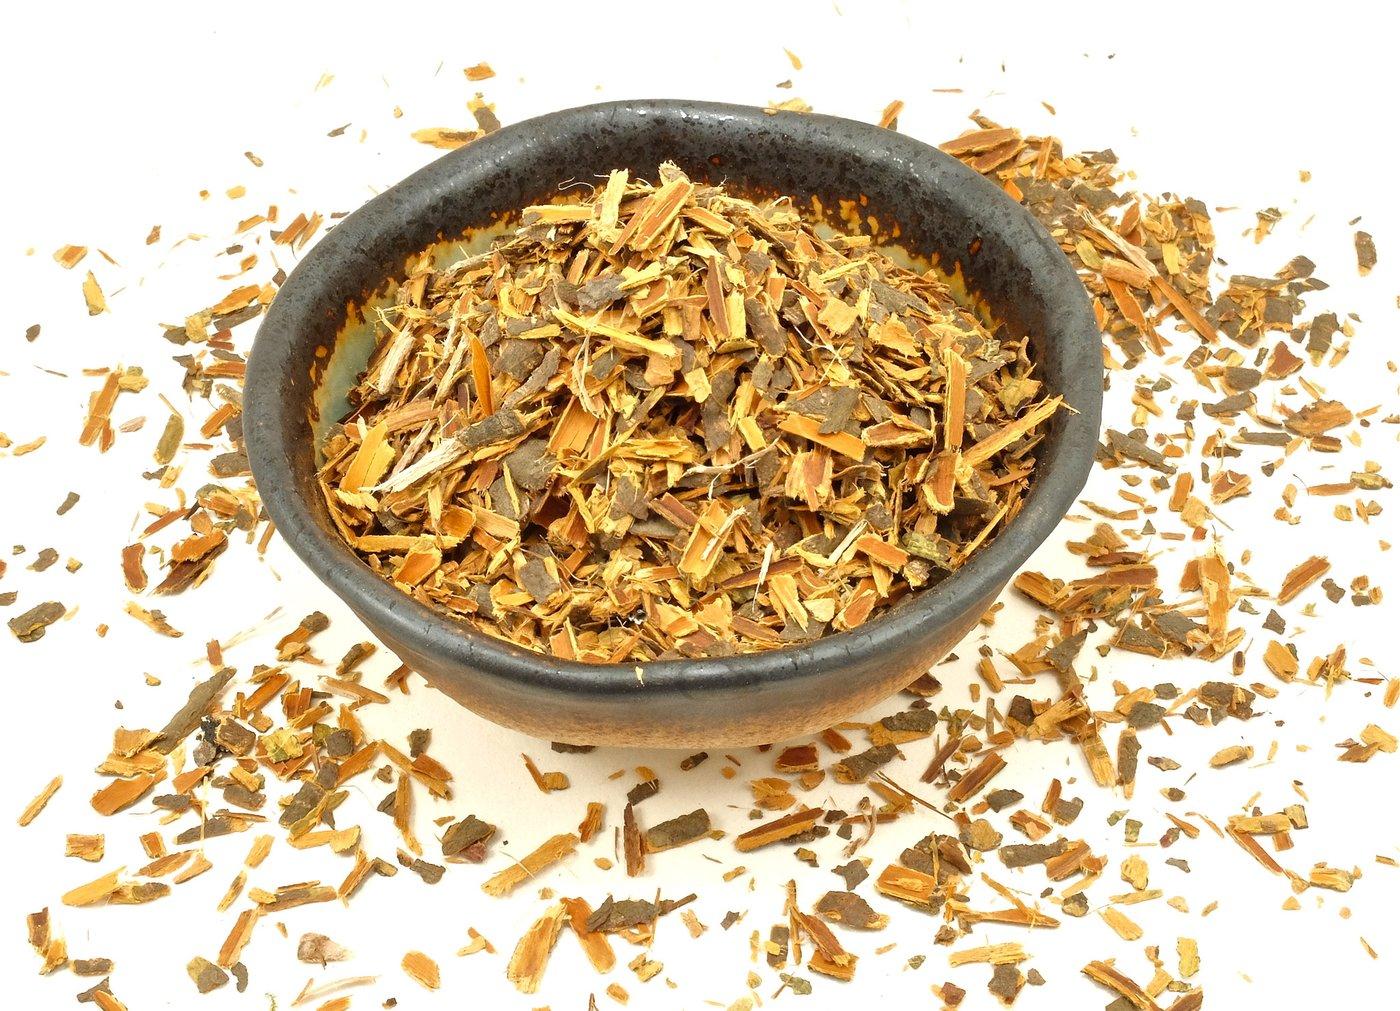 Bark buckthorn and its benefits for folk medicine